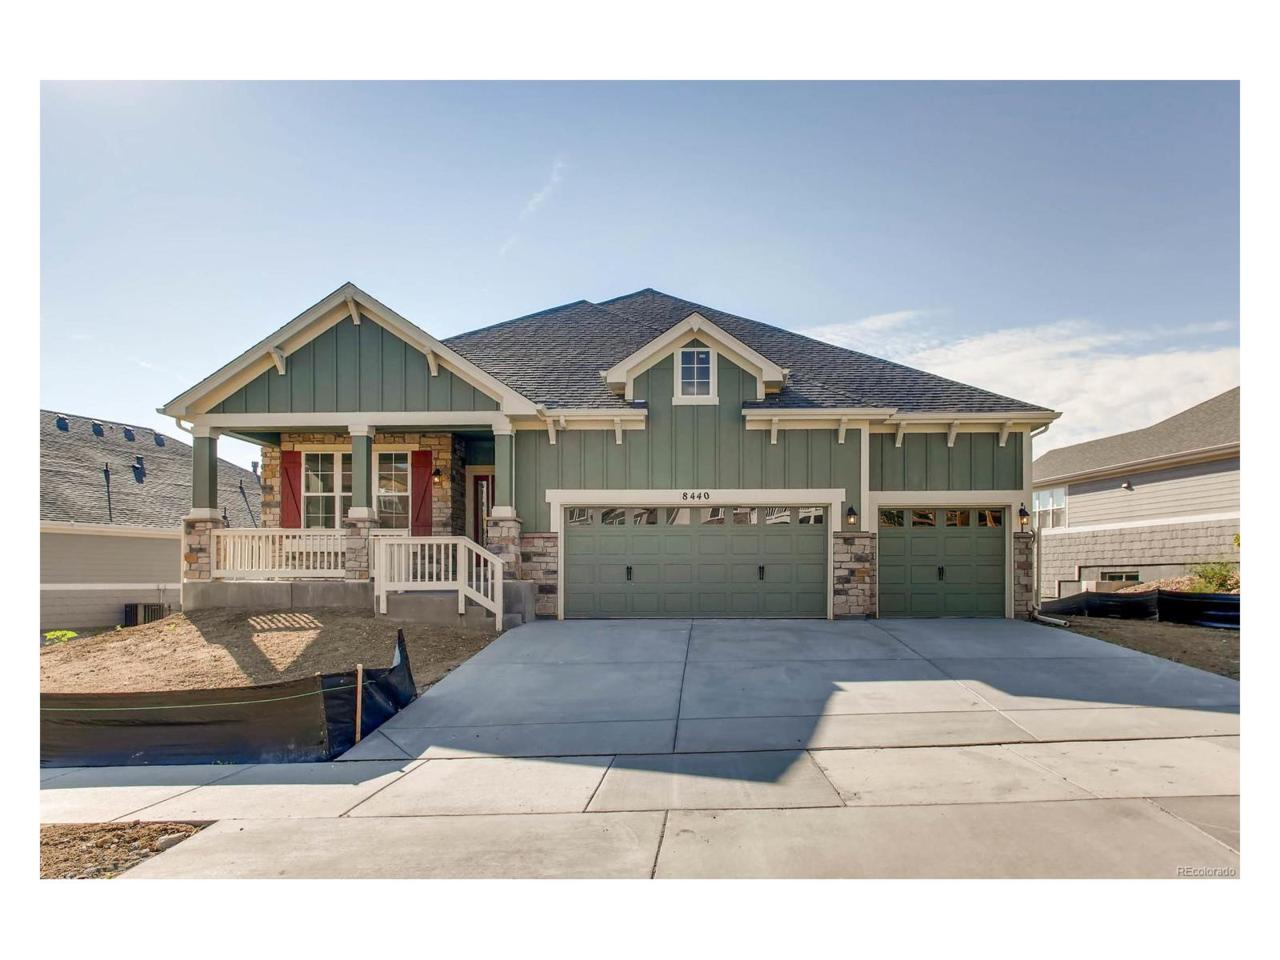 8440 Quartz Way, Arvada, CO 80007 (MLS #4133375) :: 8z Real Estate